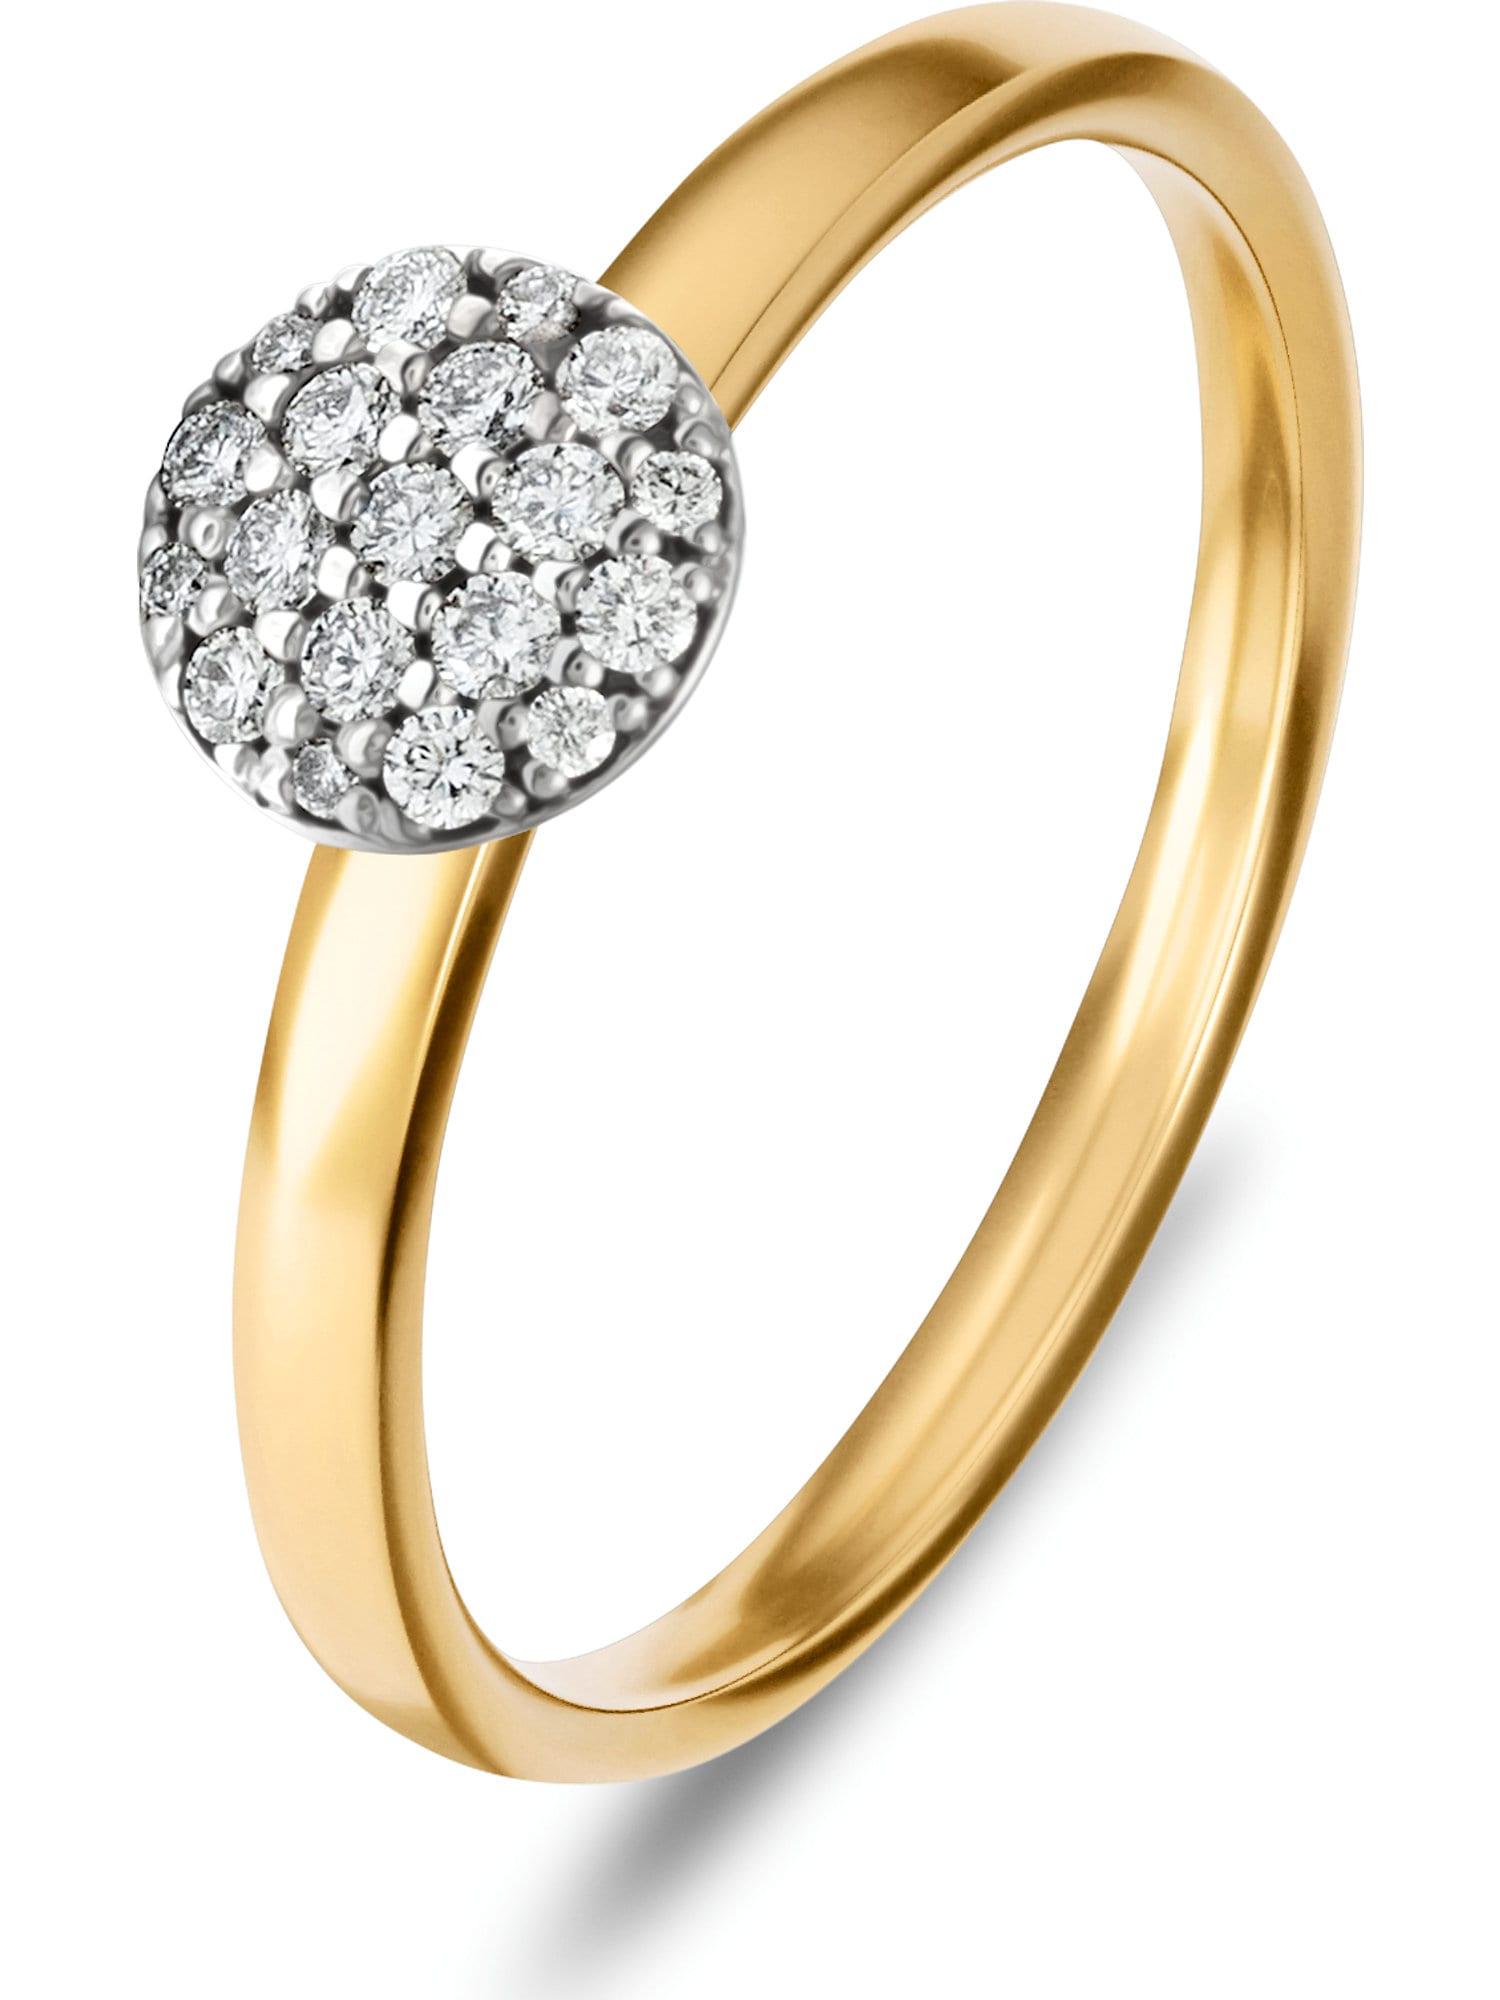 Damen Christ Ring gold, grau,  schwarz | 04043145885480